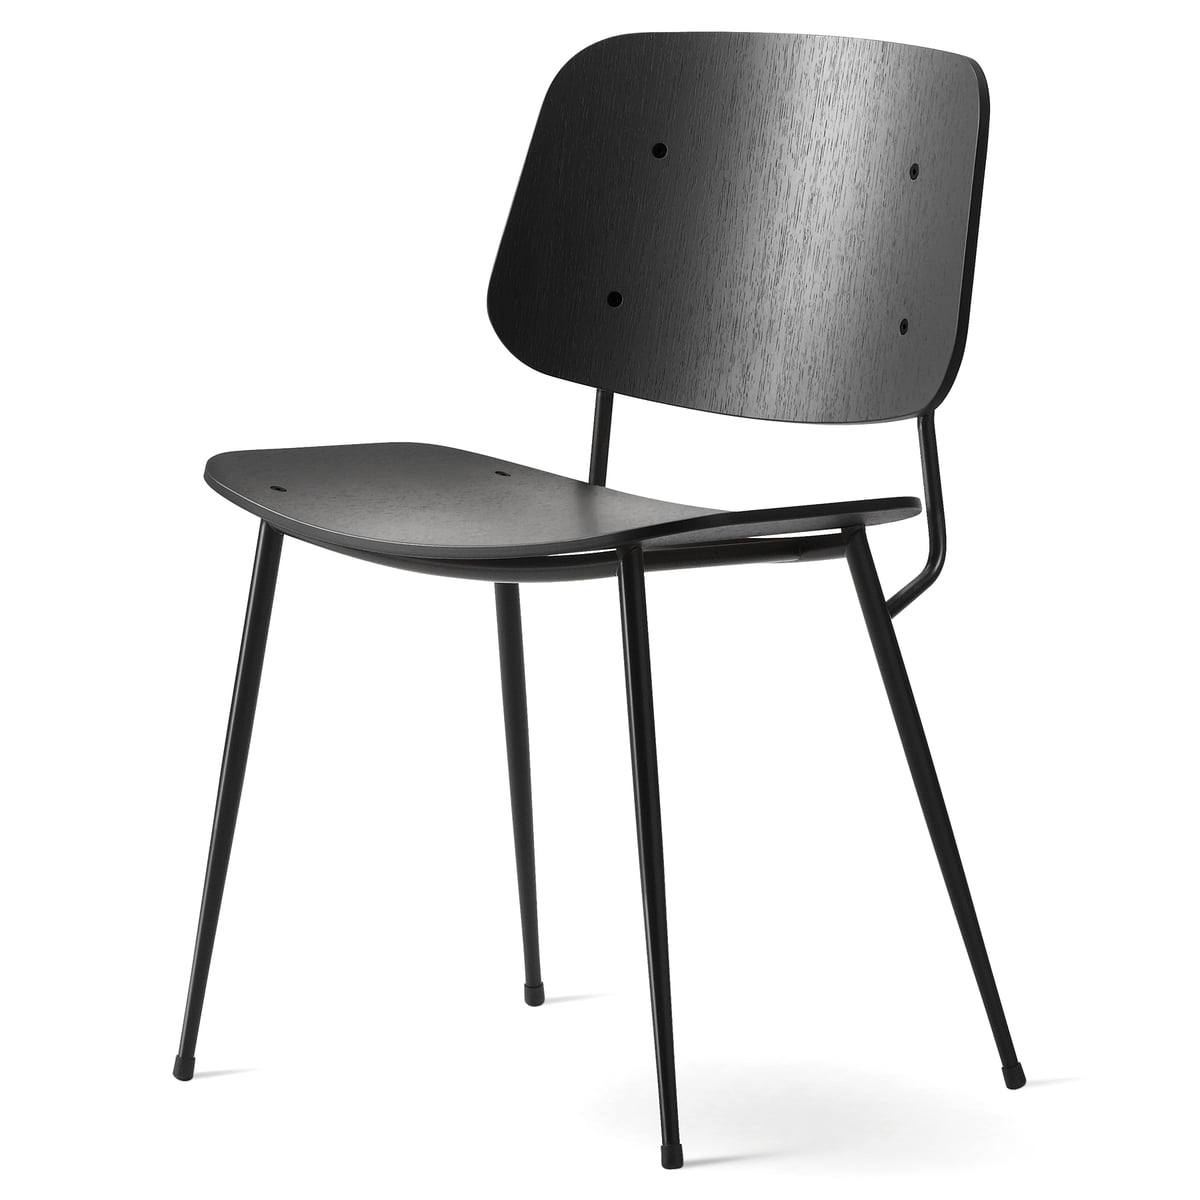 s borg stuhl model 3060 von fredericia. Black Bedroom Furniture Sets. Home Design Ideas